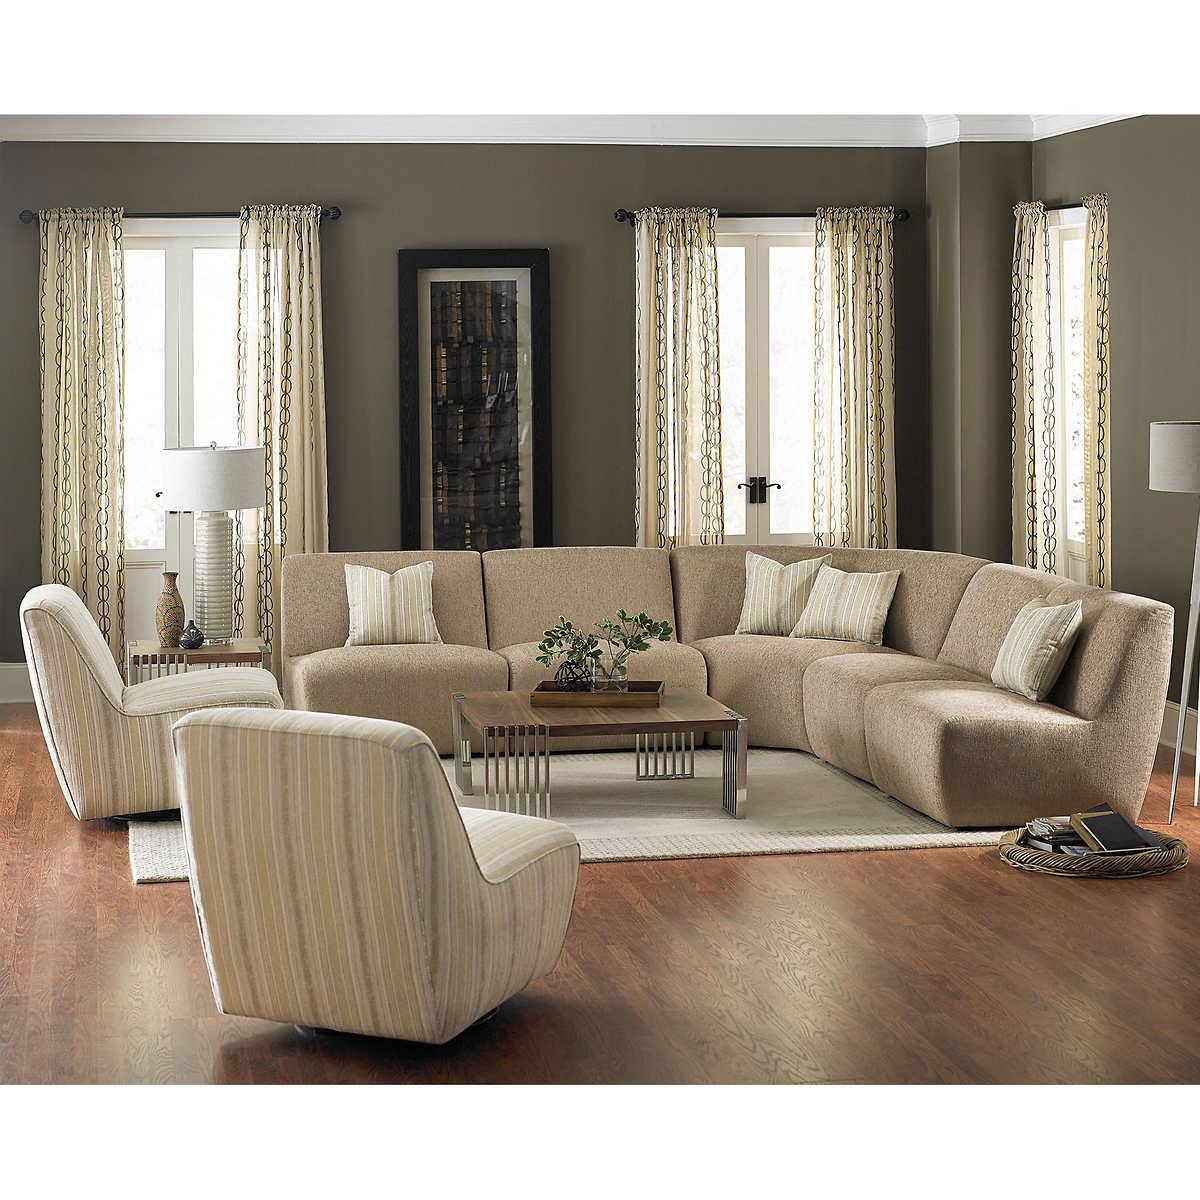 Vista 7 piece Fabric SectionalFabric Sofas   Sectionals   Costco. Costco Furniture Living Room. Home Design Ideas